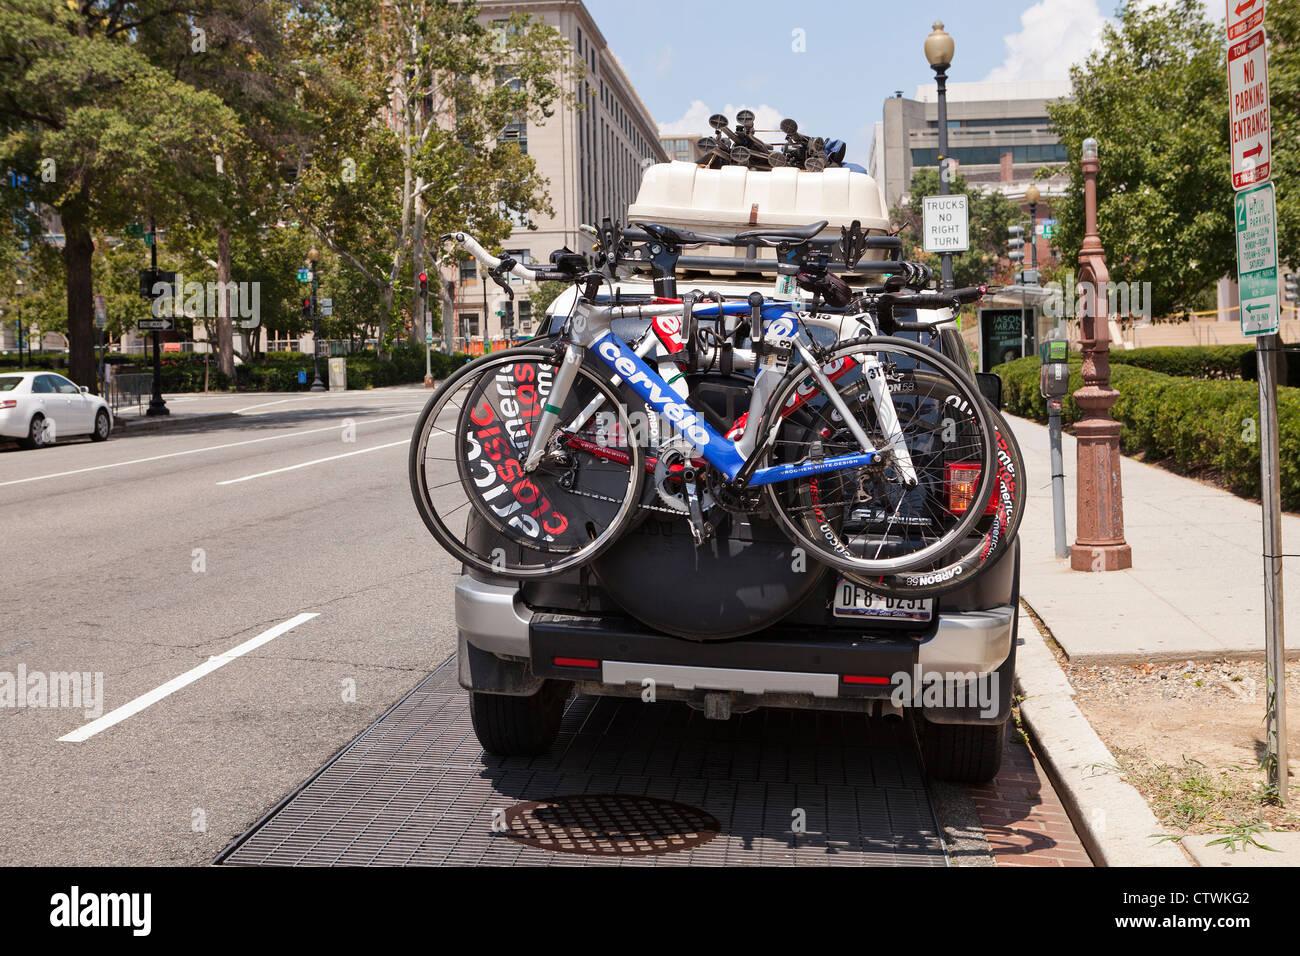 Bicycles on rear mounted bike rack - USA - Stock Image